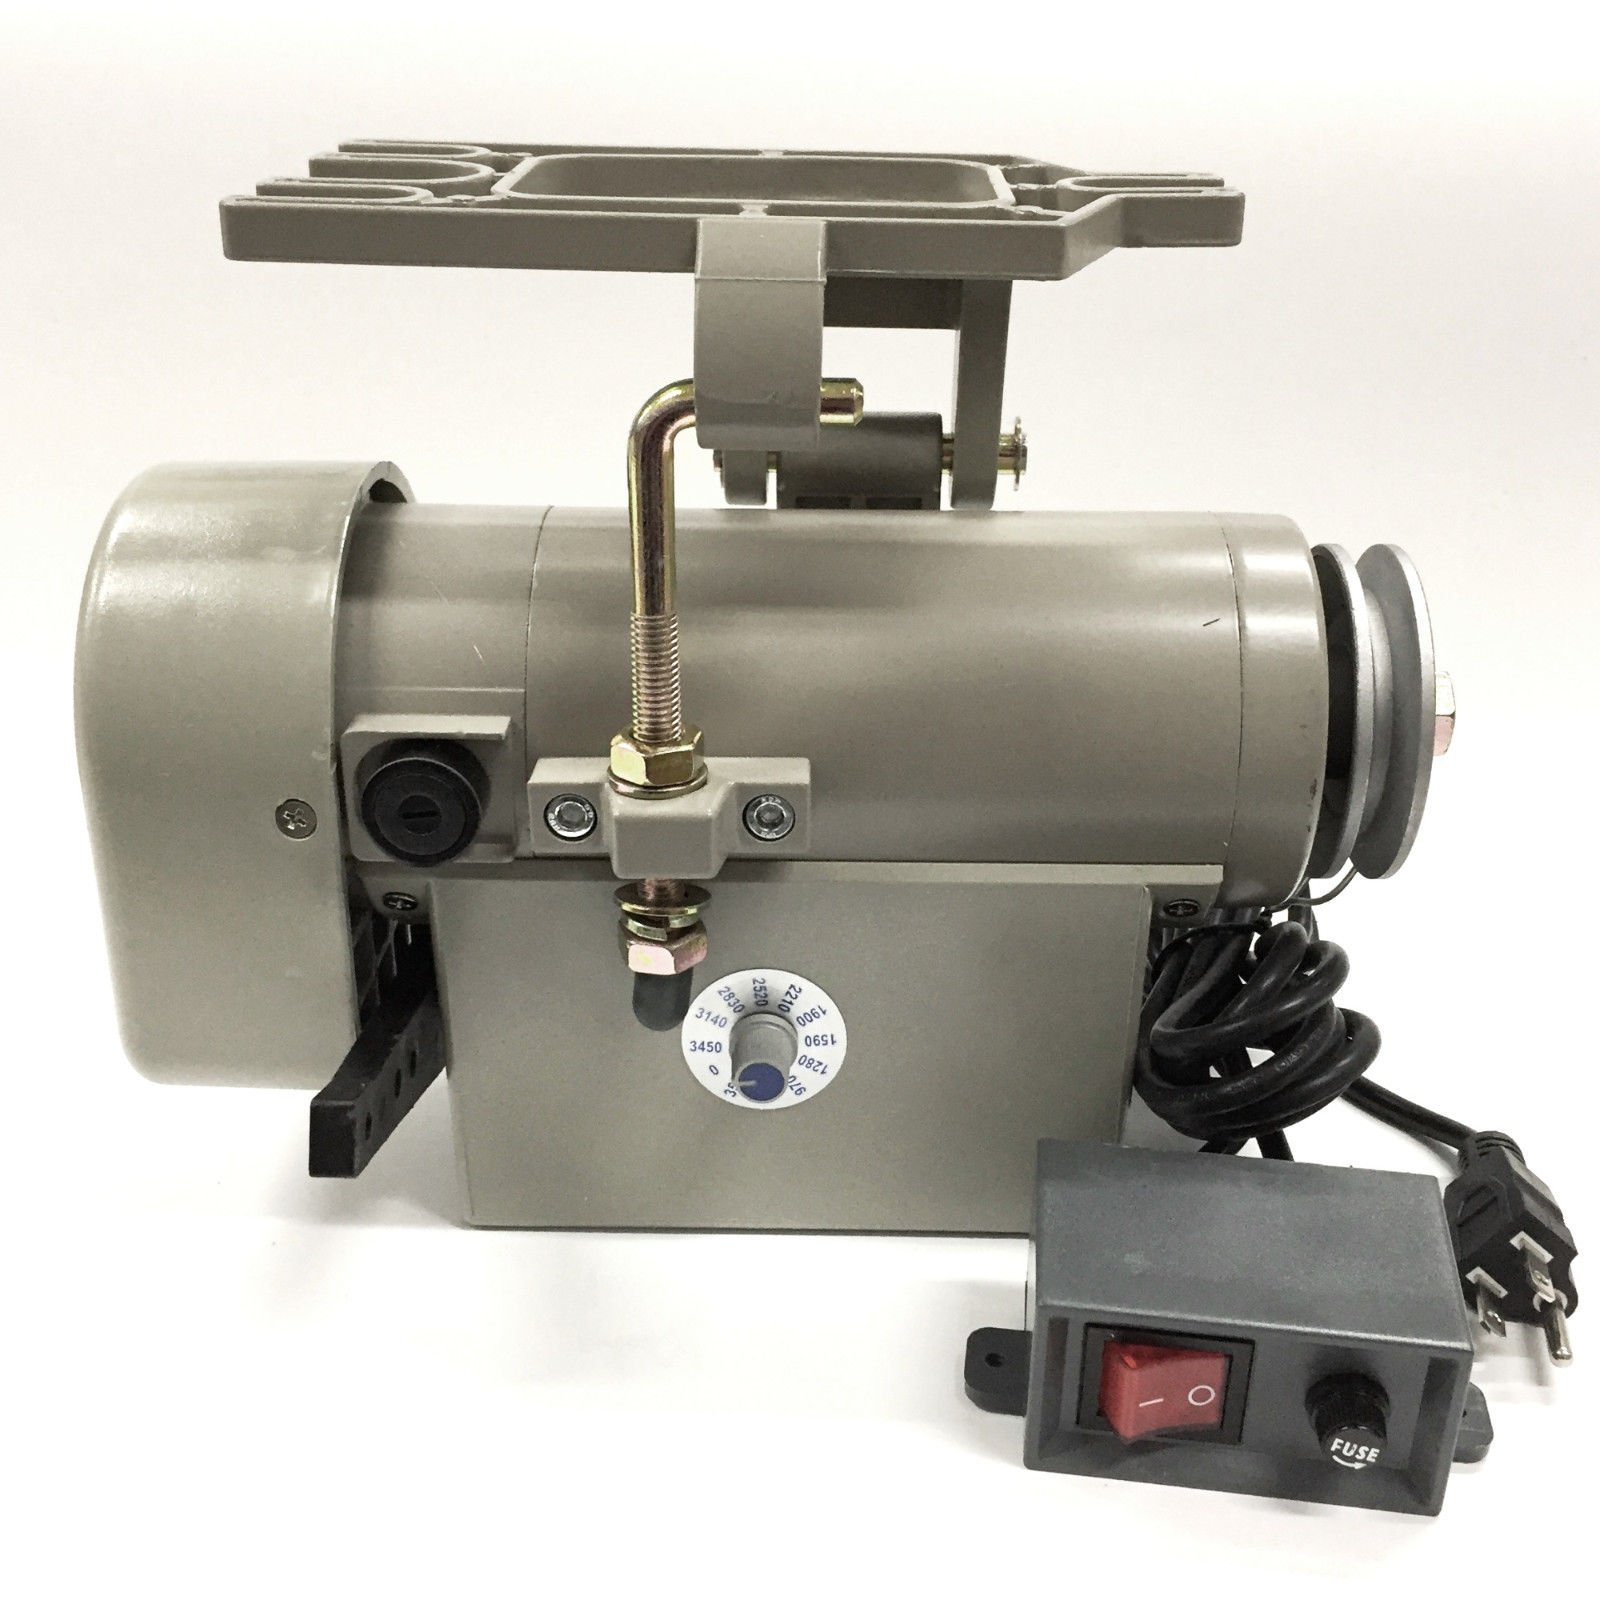 Eagle EL-550 Sewing Machine Servo Motor - 550 Watt, 110 Volt, Noiseless Motor by Eagle